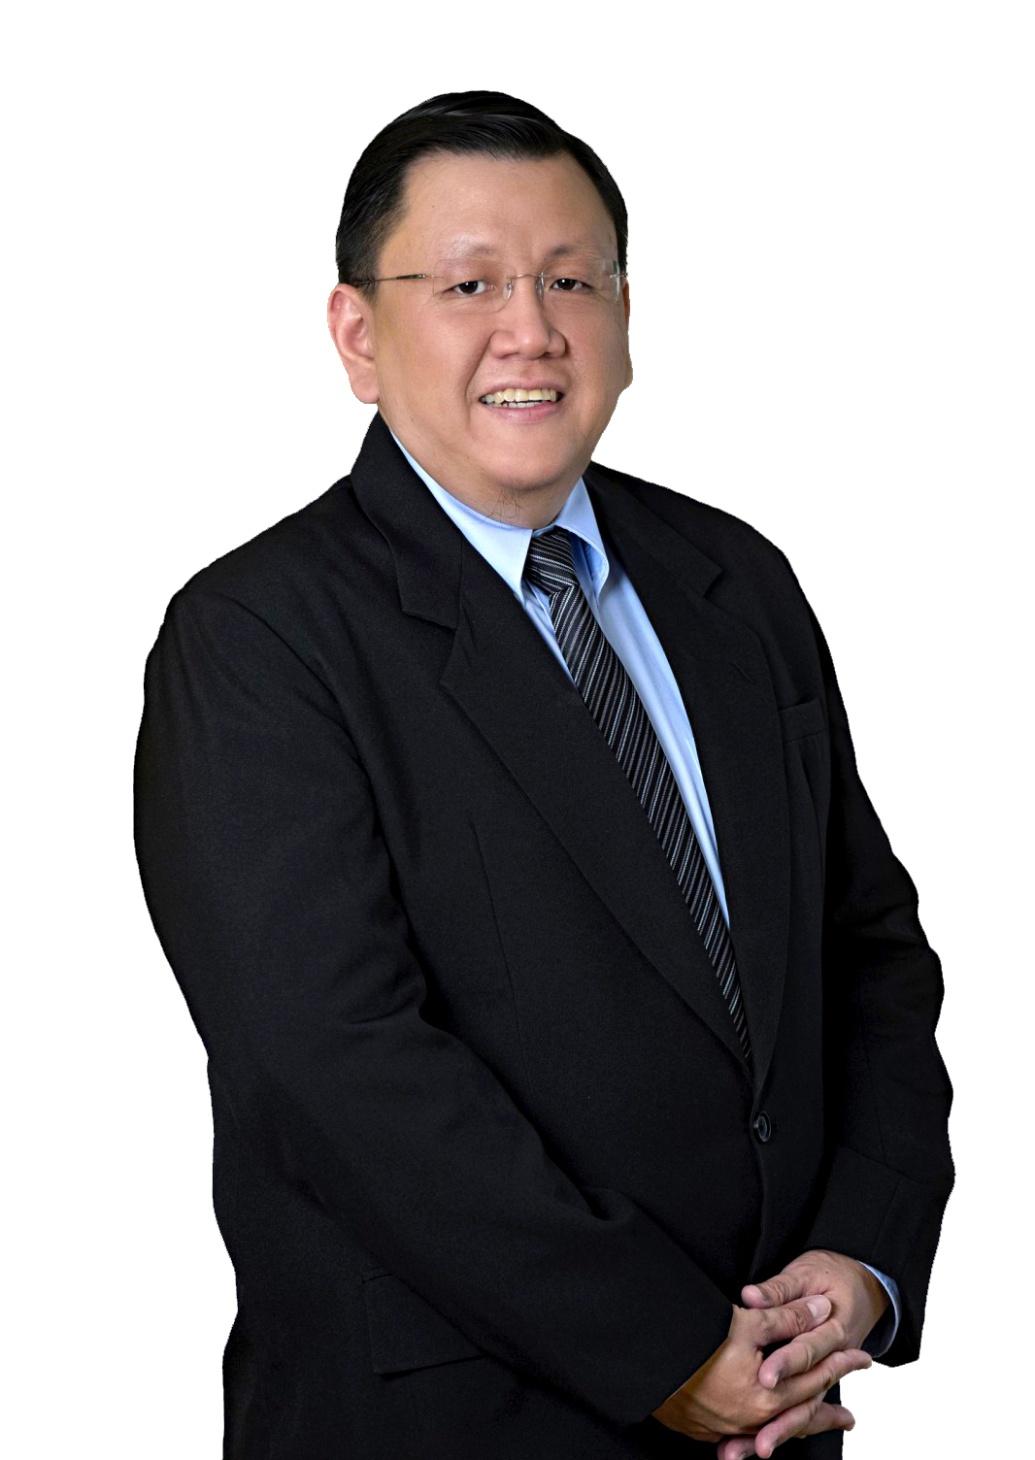 C:\Users\GCPI-ROBBY\Desktop\MBM 2021\B - Alliance Pacific Resources Corporation Chairman & CEO Steven Alain Yu, MCCI President.jpg